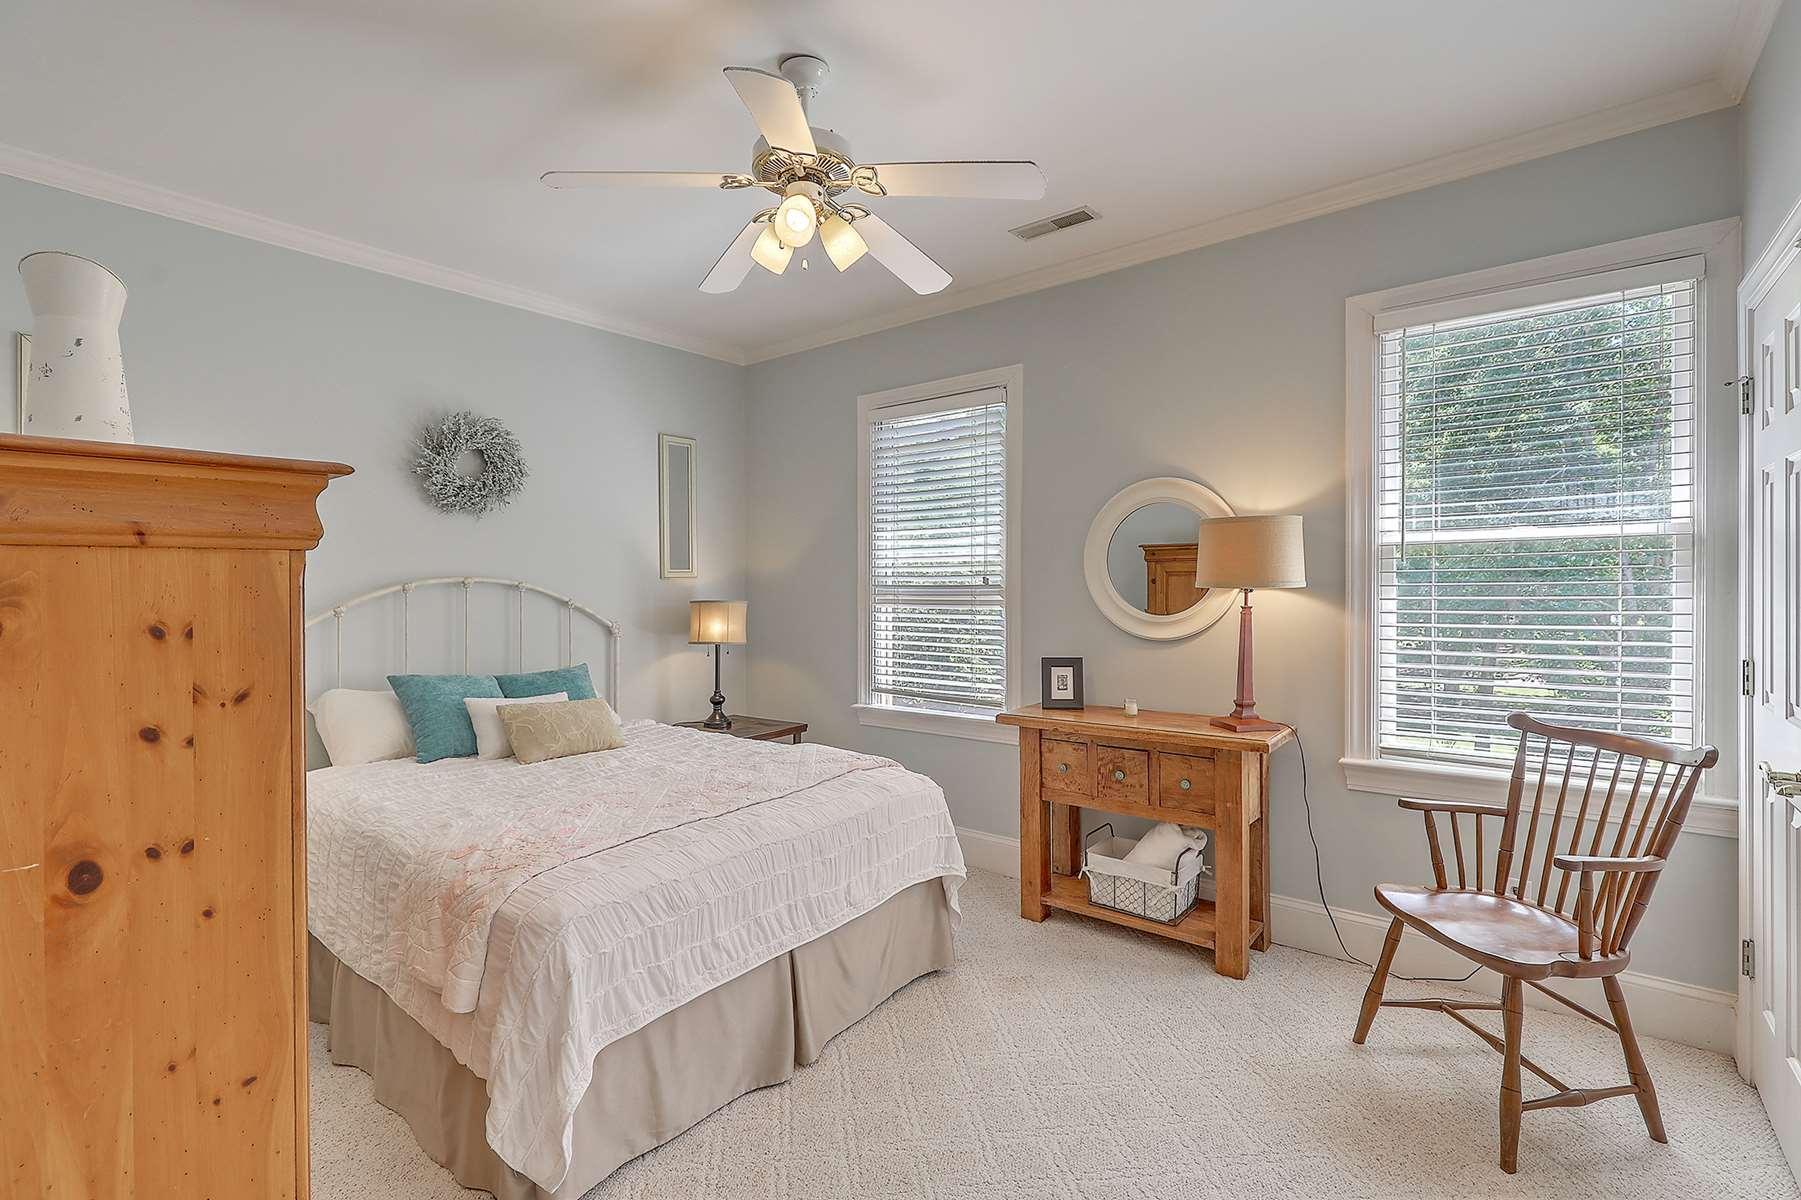 Dunes West Homes For Sale - 2961 Pignatelli, Mount Pleasant, SC - 51